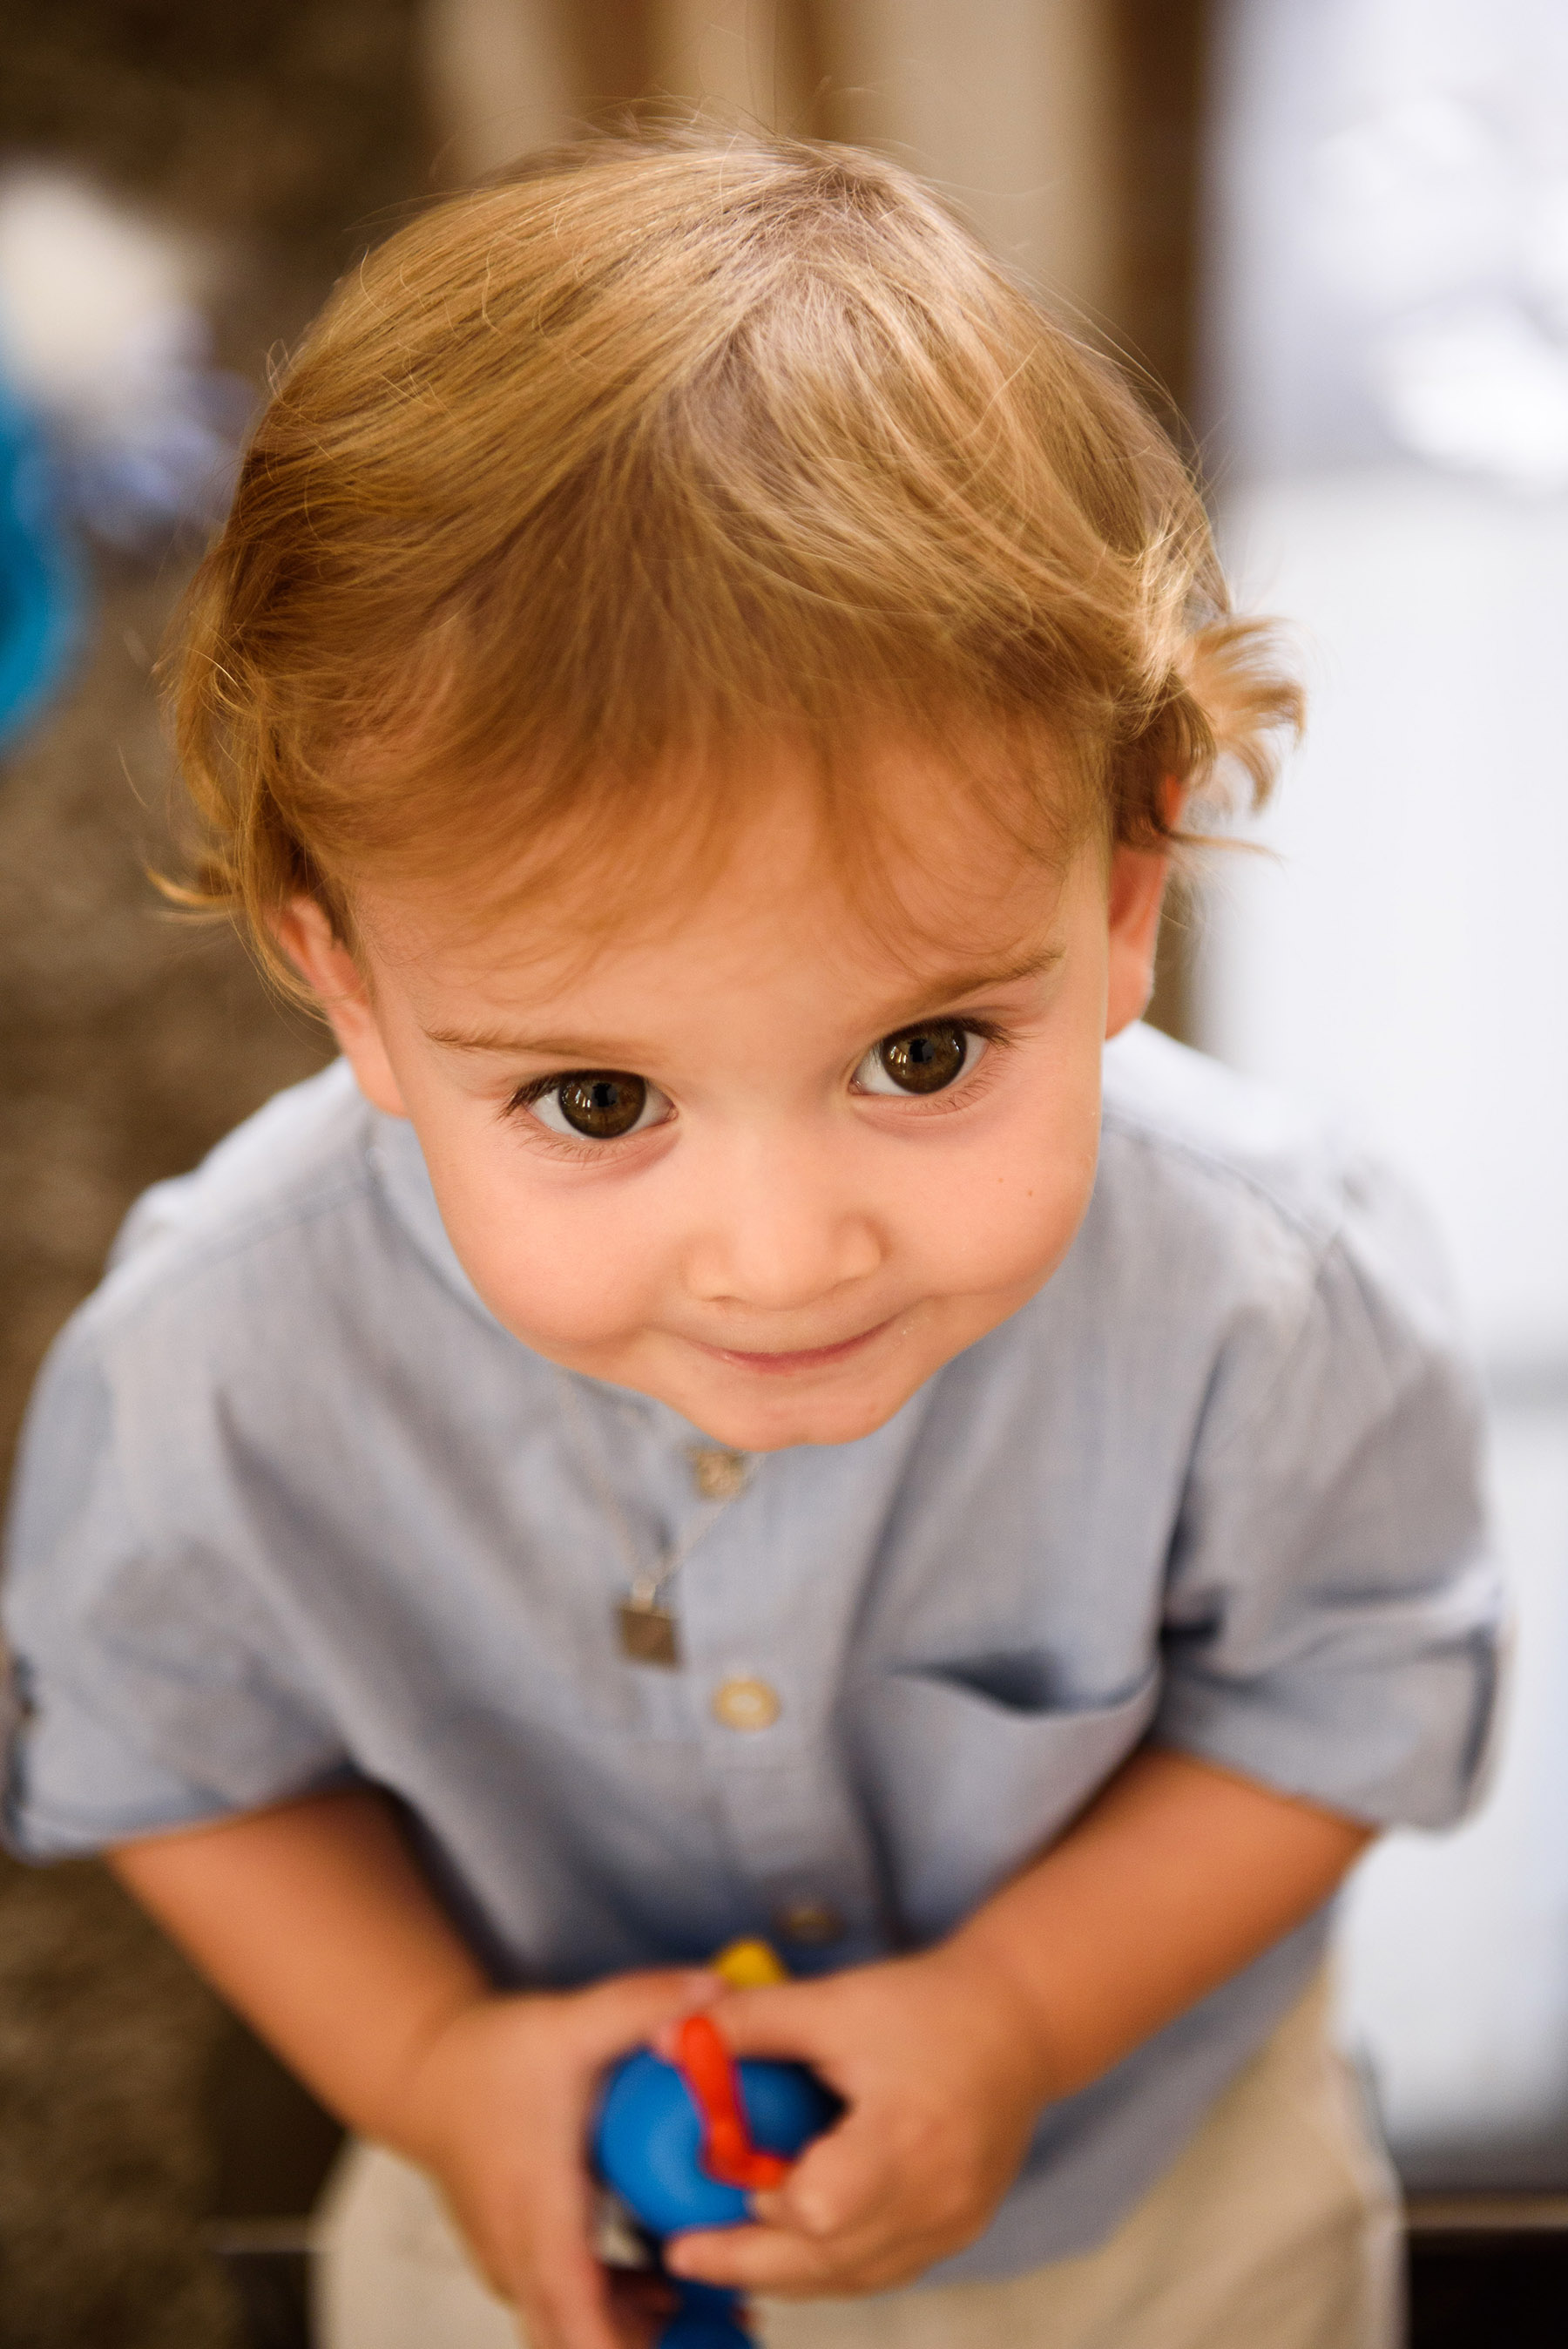 13_batizado_curitiba_fotografia_infantil_familias_fotografo_guswanderley.jpg